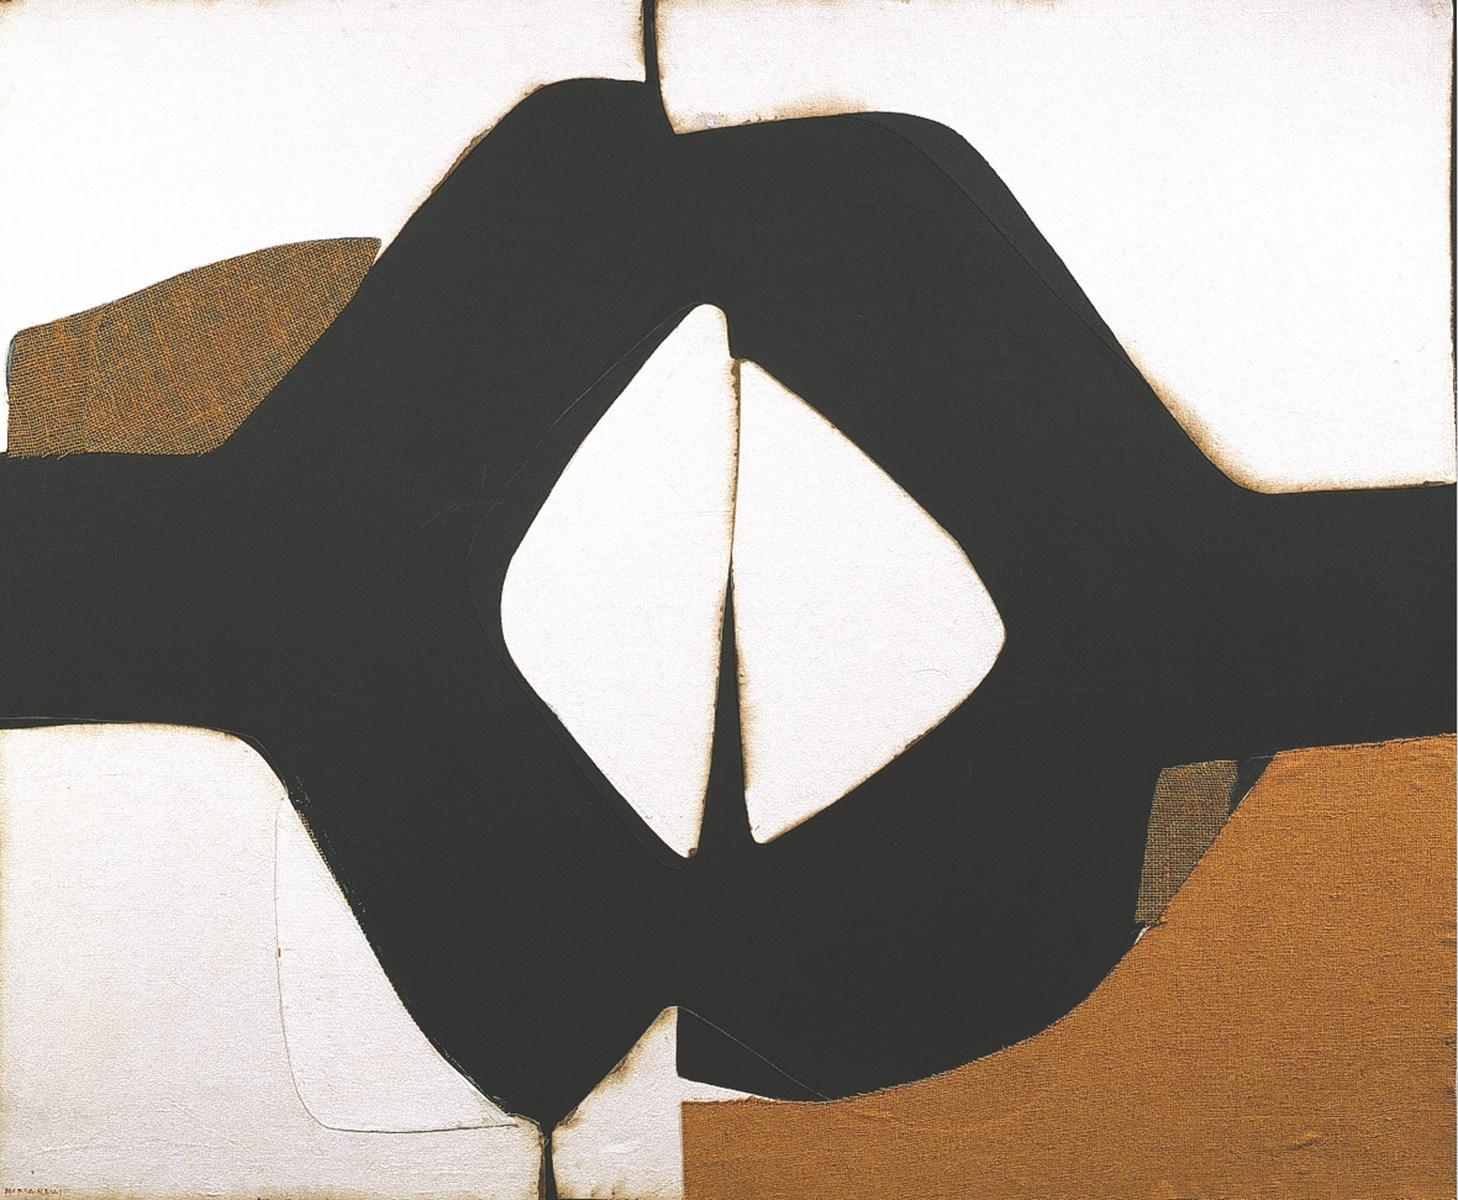 Marca-Relli Conrad - L-9-74 1974 - collage and mixed media on canvas - 152,4 x 182,9 cm